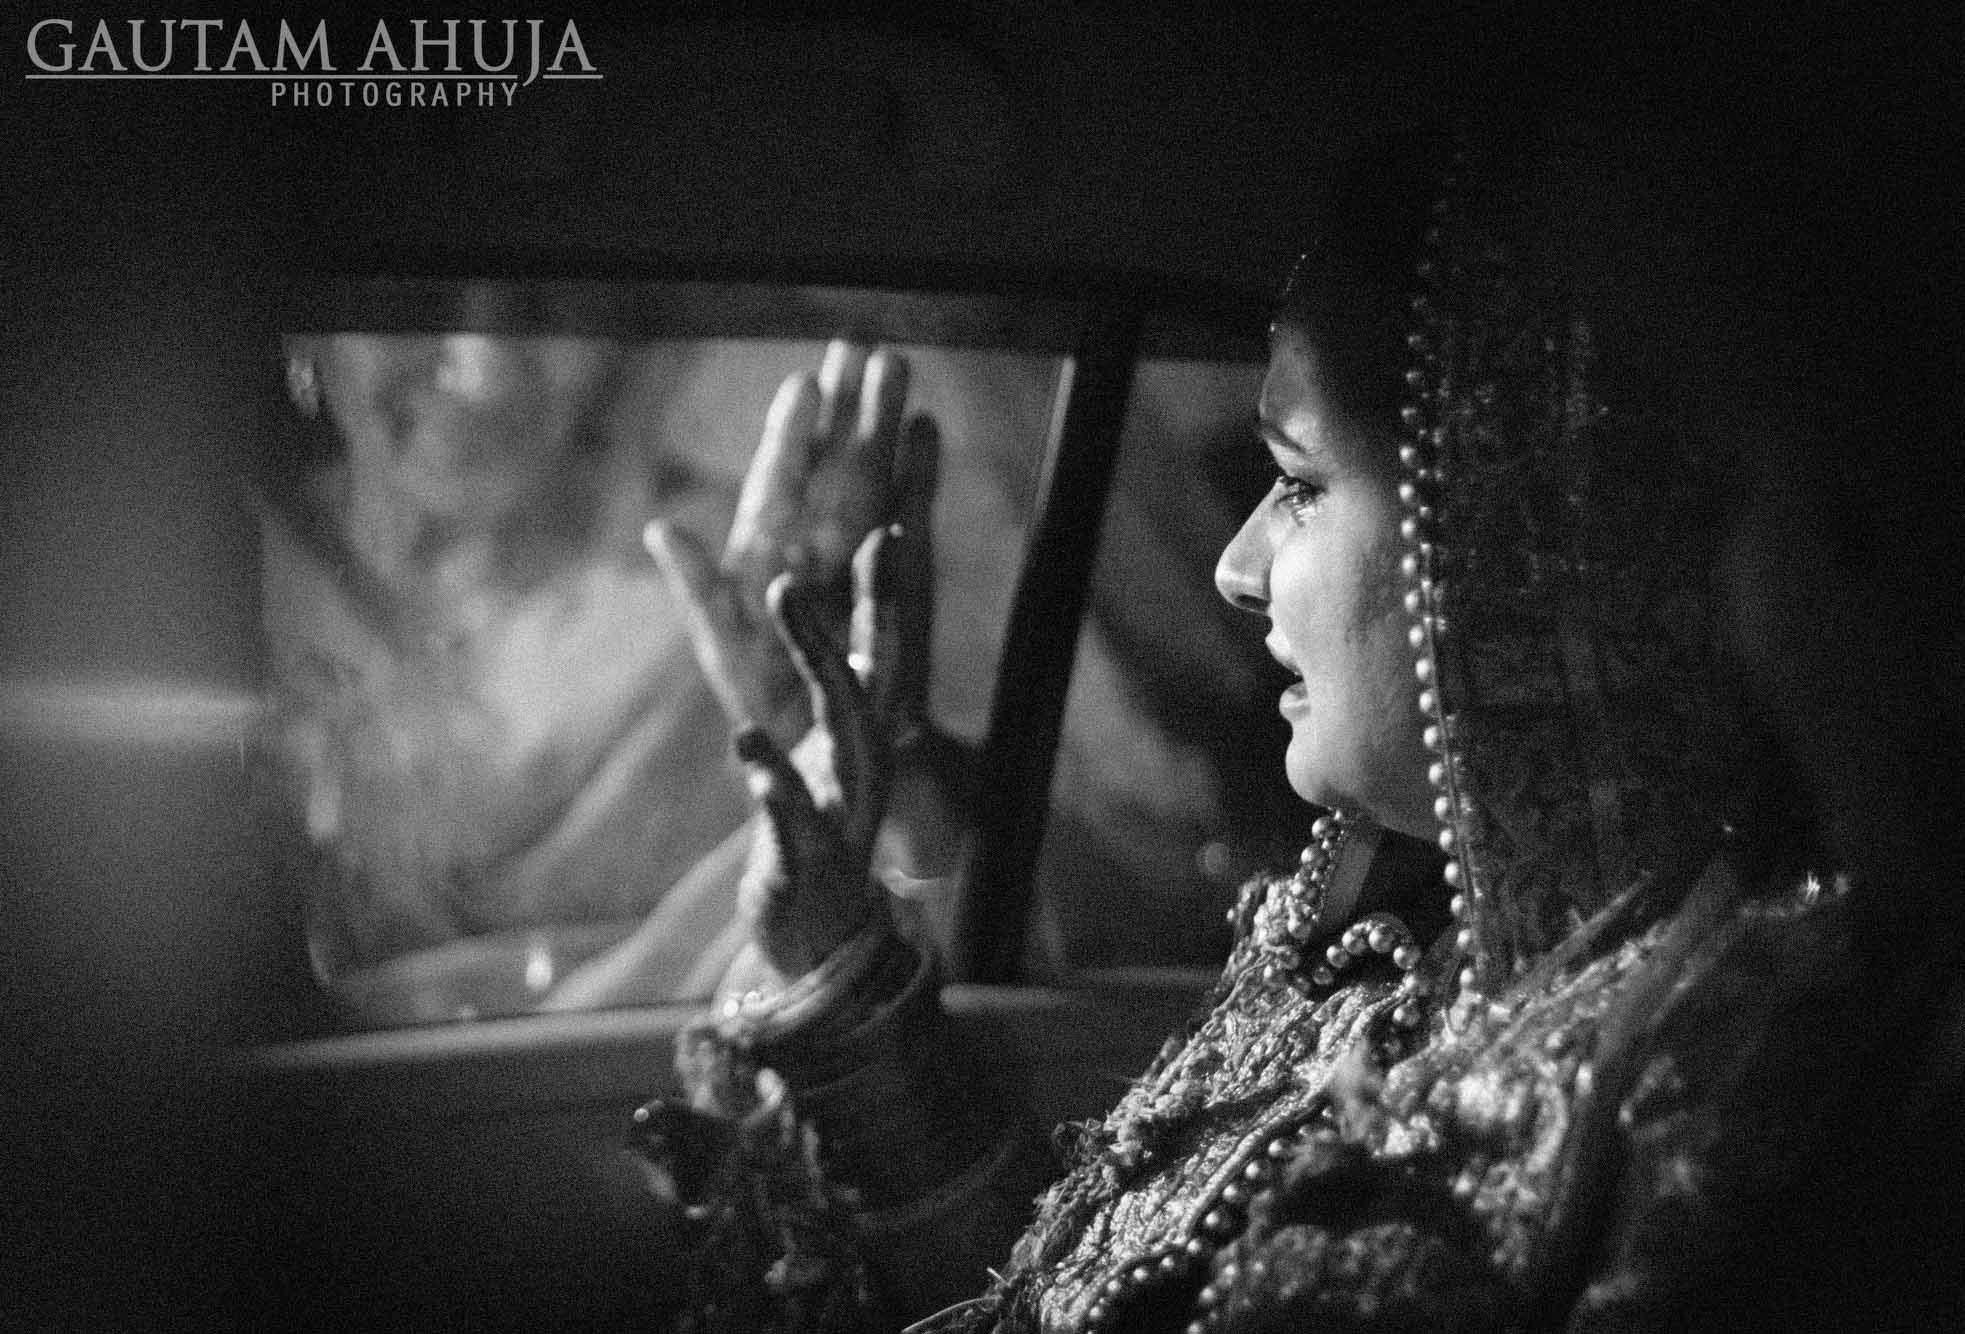 Gautam Ahuja's